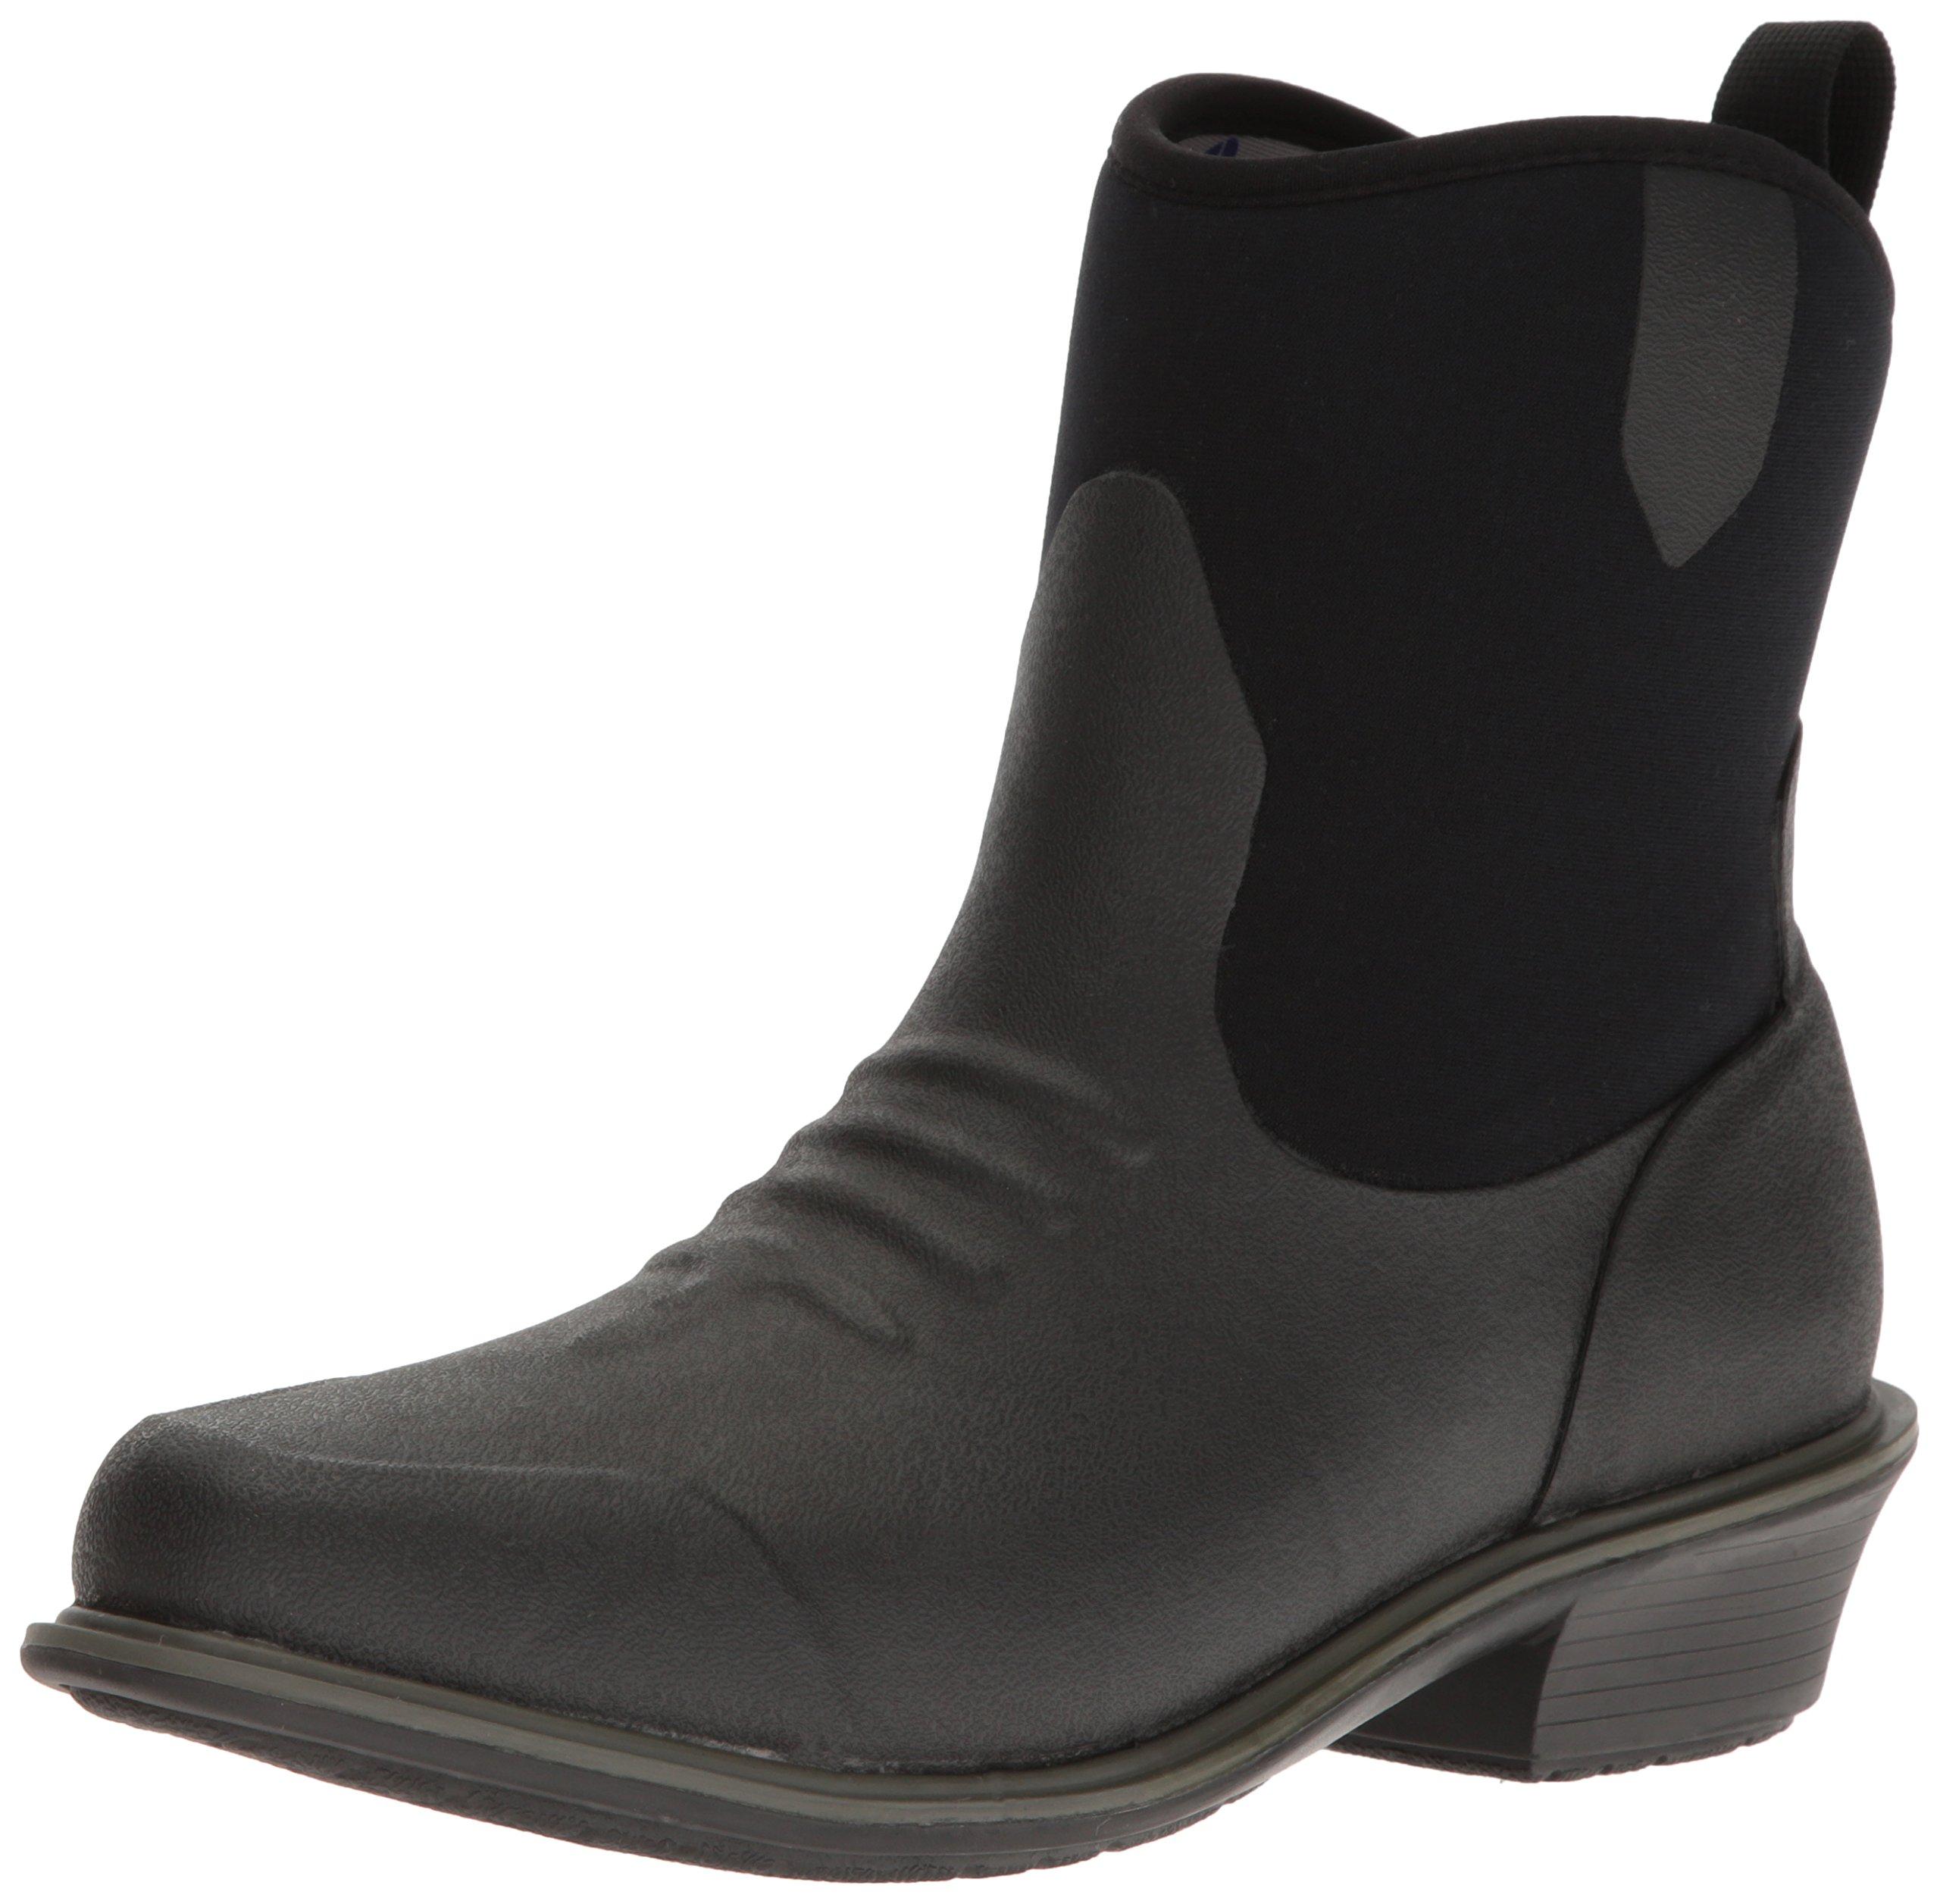 Muck Boot Women's Juliet Snow Boot, Black, 7 M US